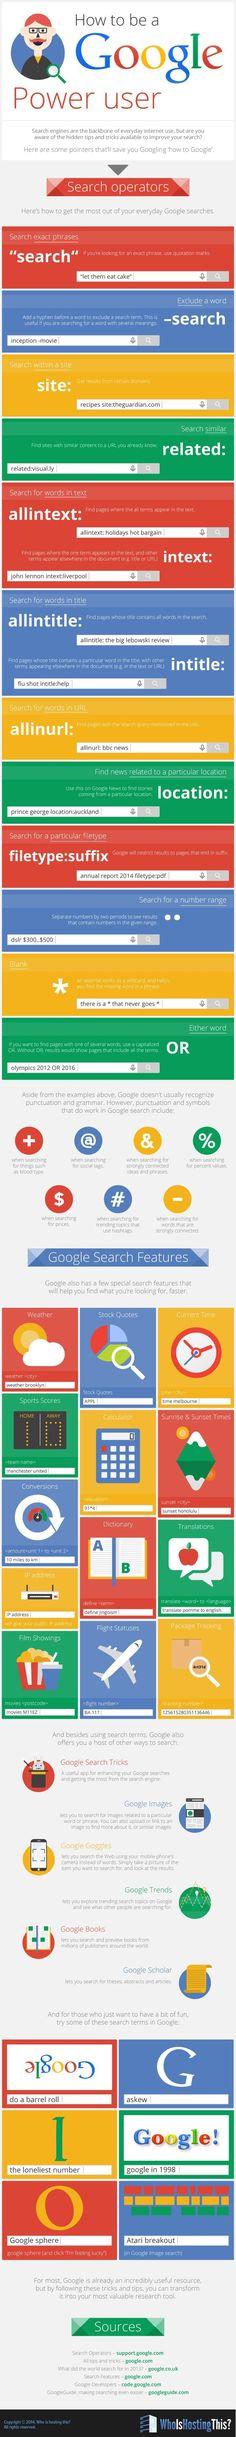 ¿De verdad sabes buscar en Google? Sigue estos 12 consejos…  Latest News & Trends on #digitalmarketing | http://webworksagency.com